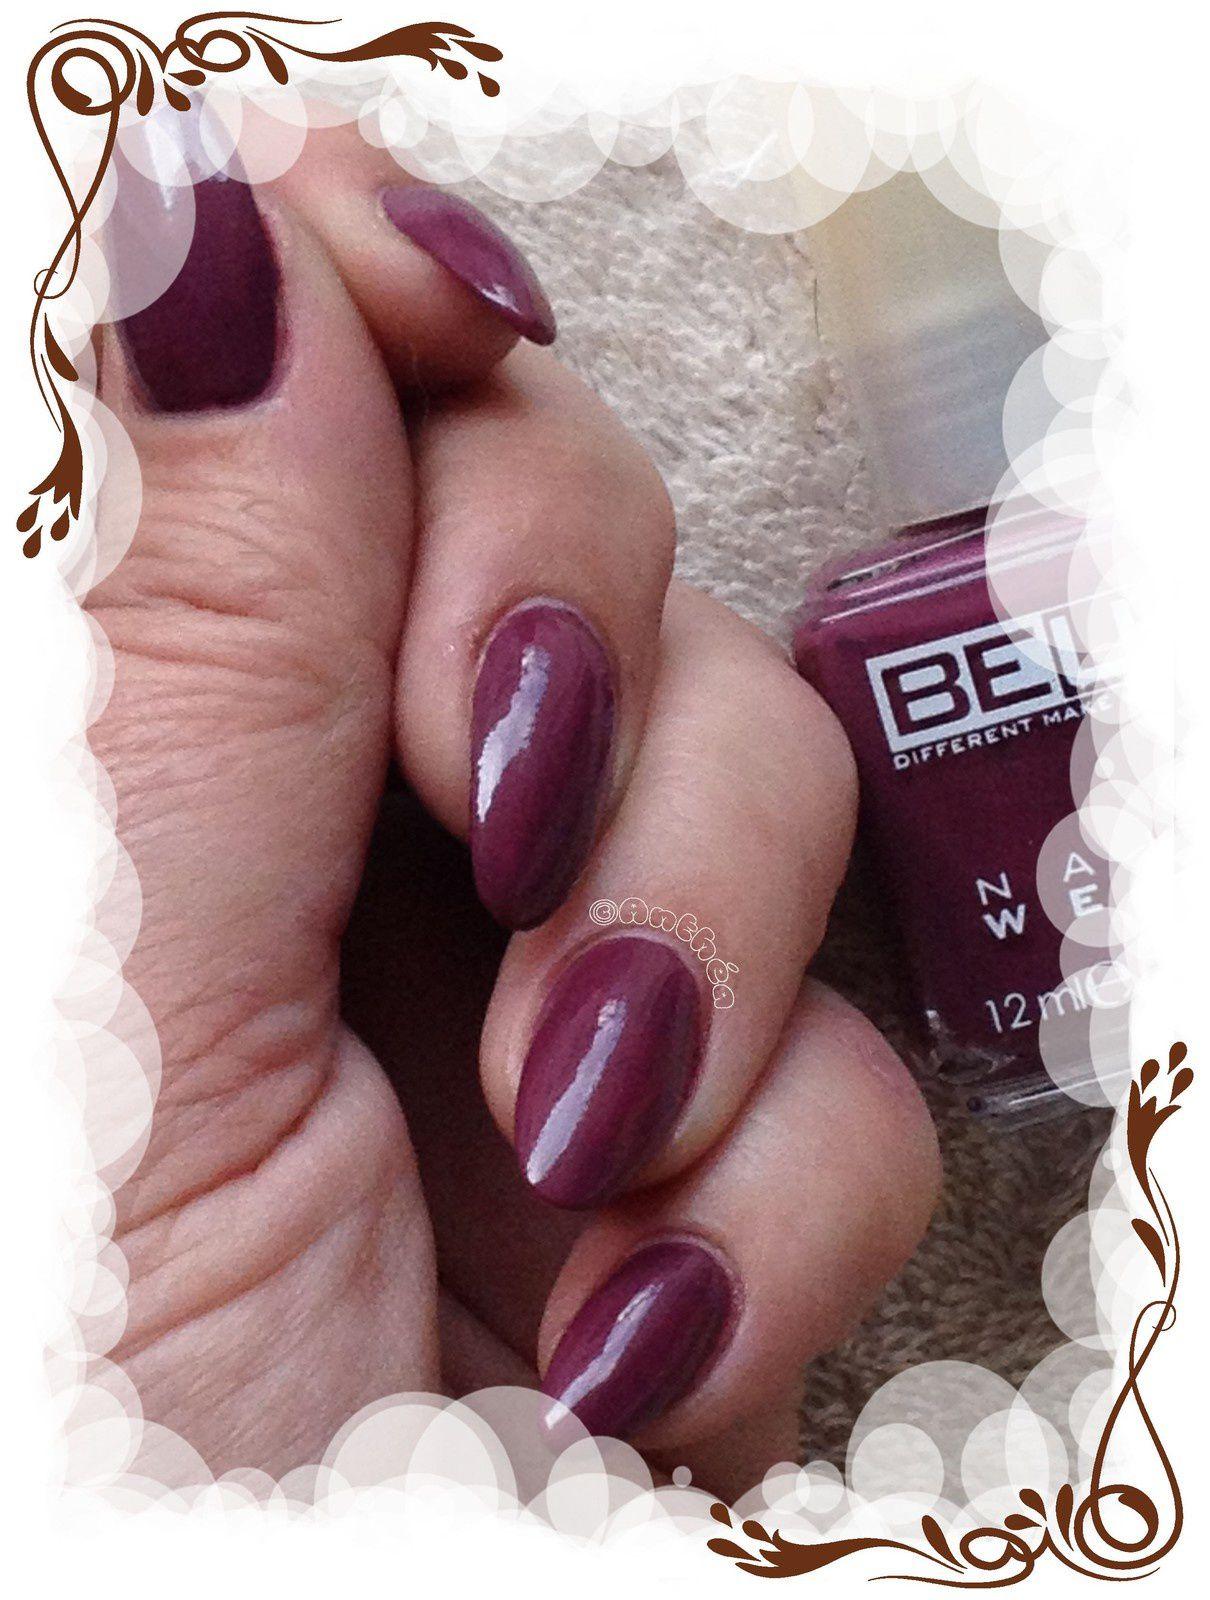 BEUP n°56 nail wear